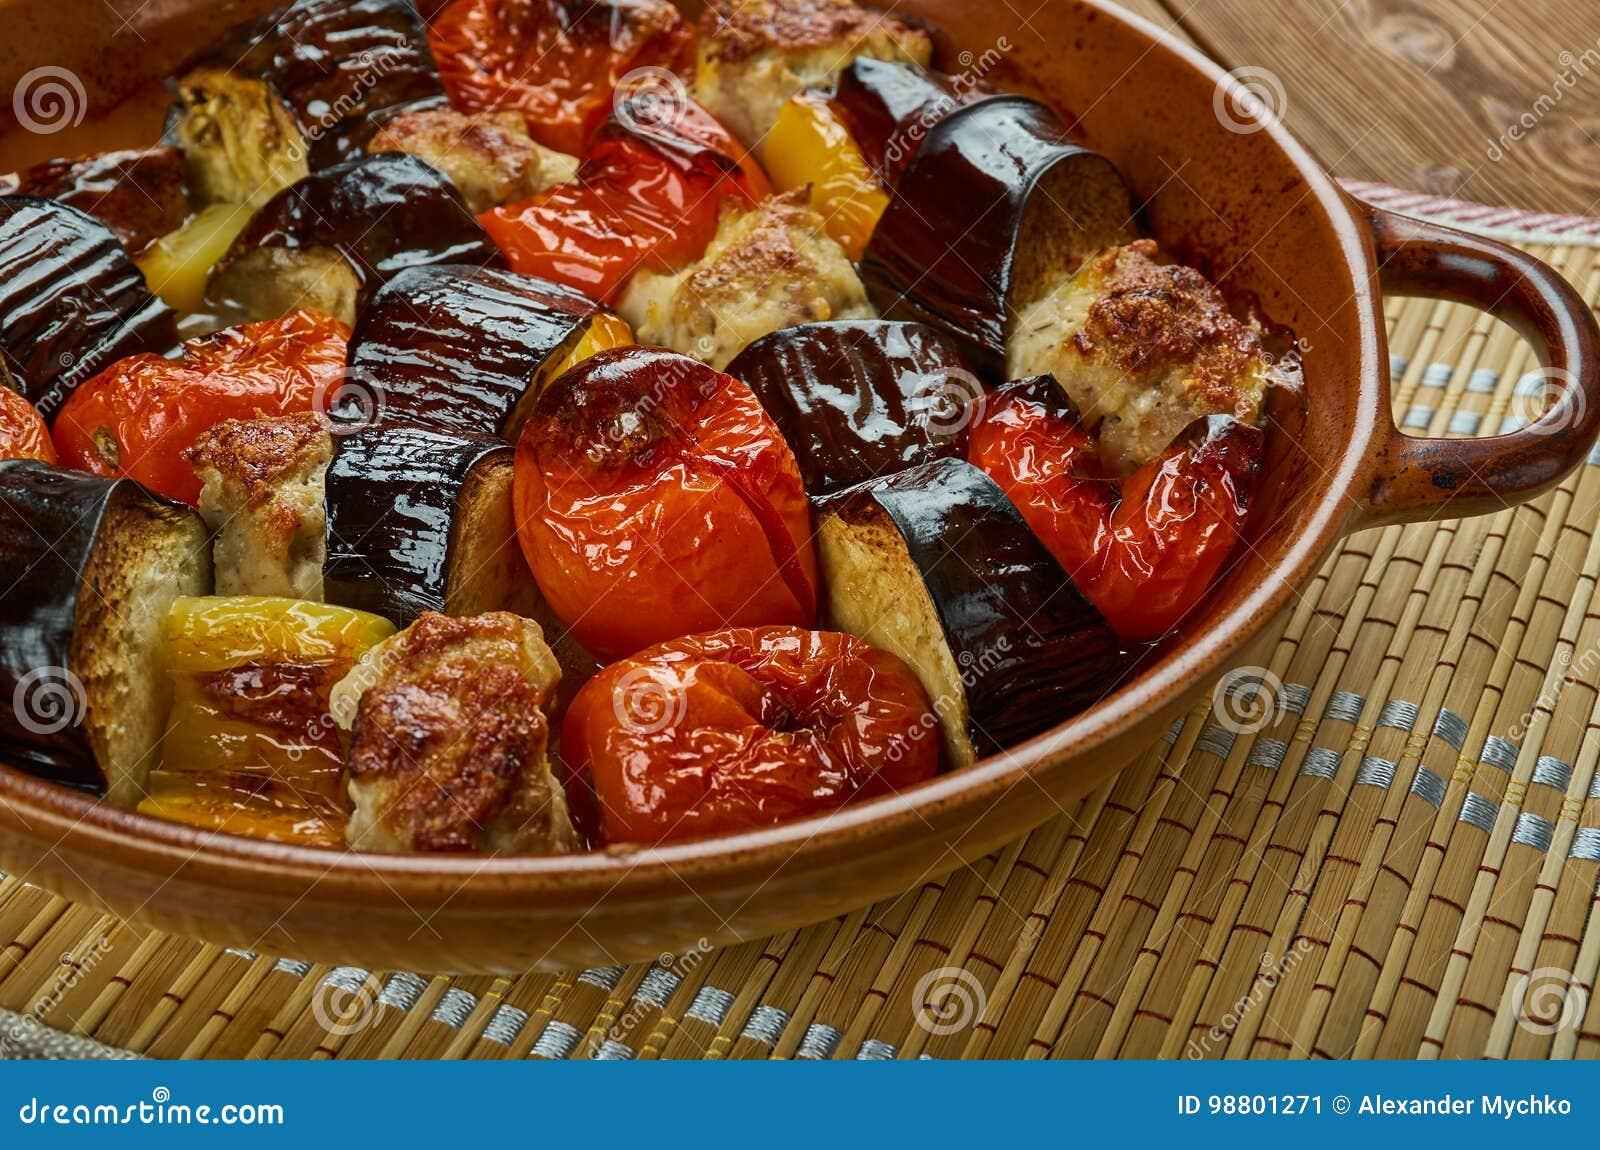 Azerbaijan tava-kebab stock image  Image of roast